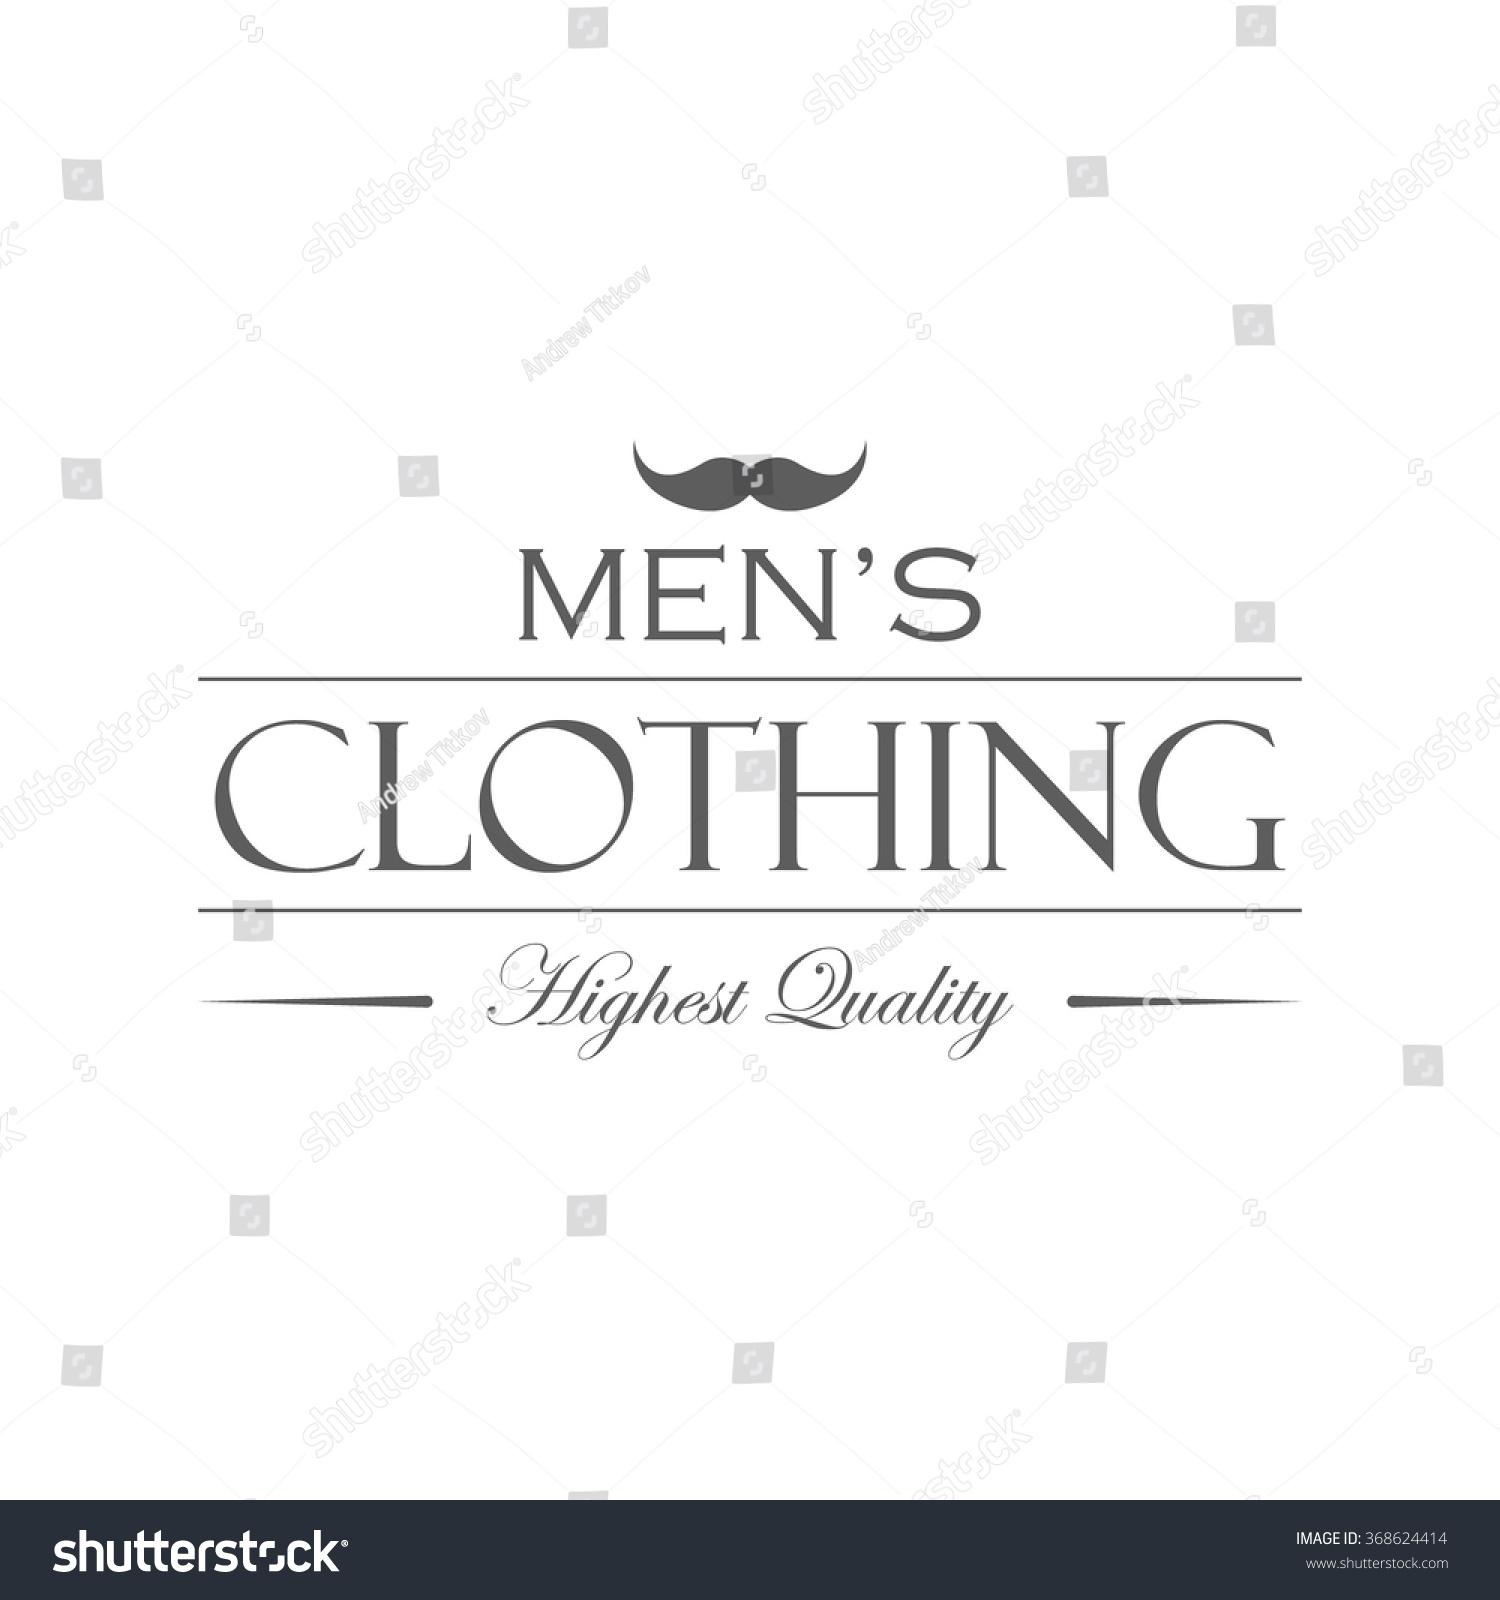 Men Clothing Sites